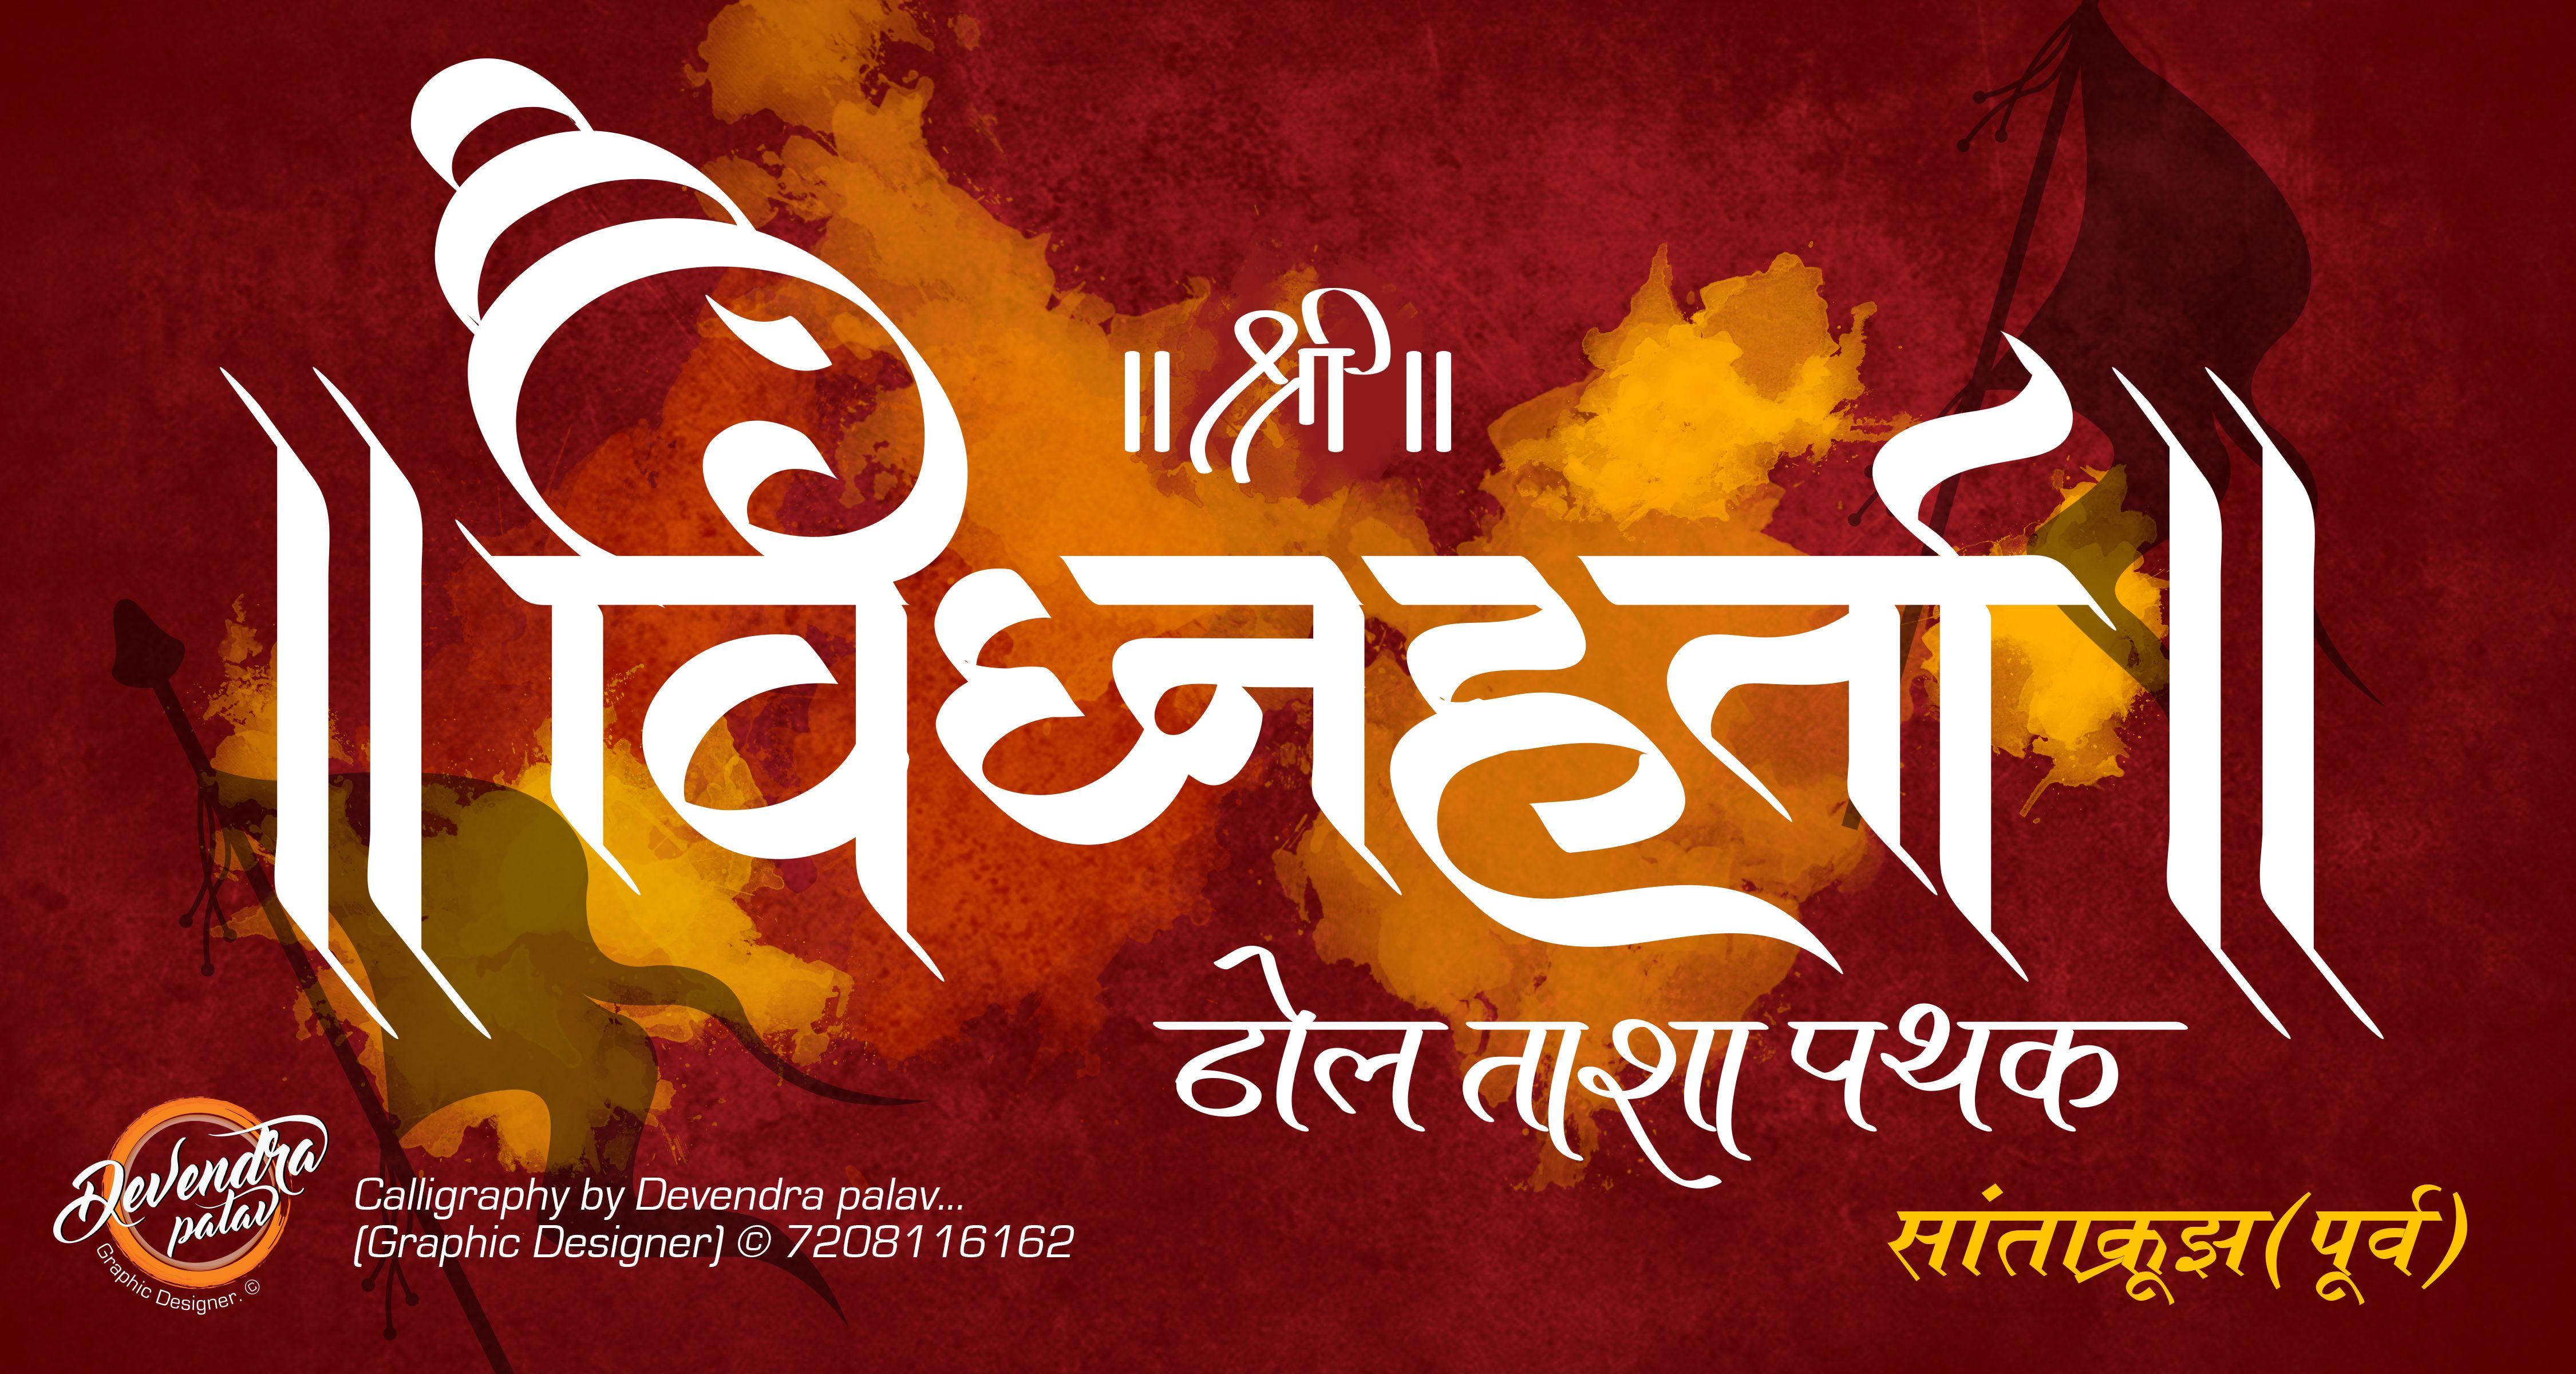 Devendra Name 3d Wallpaper Marathi Calligraphy Vighnaharta Dhol Tasha Pathak 2017